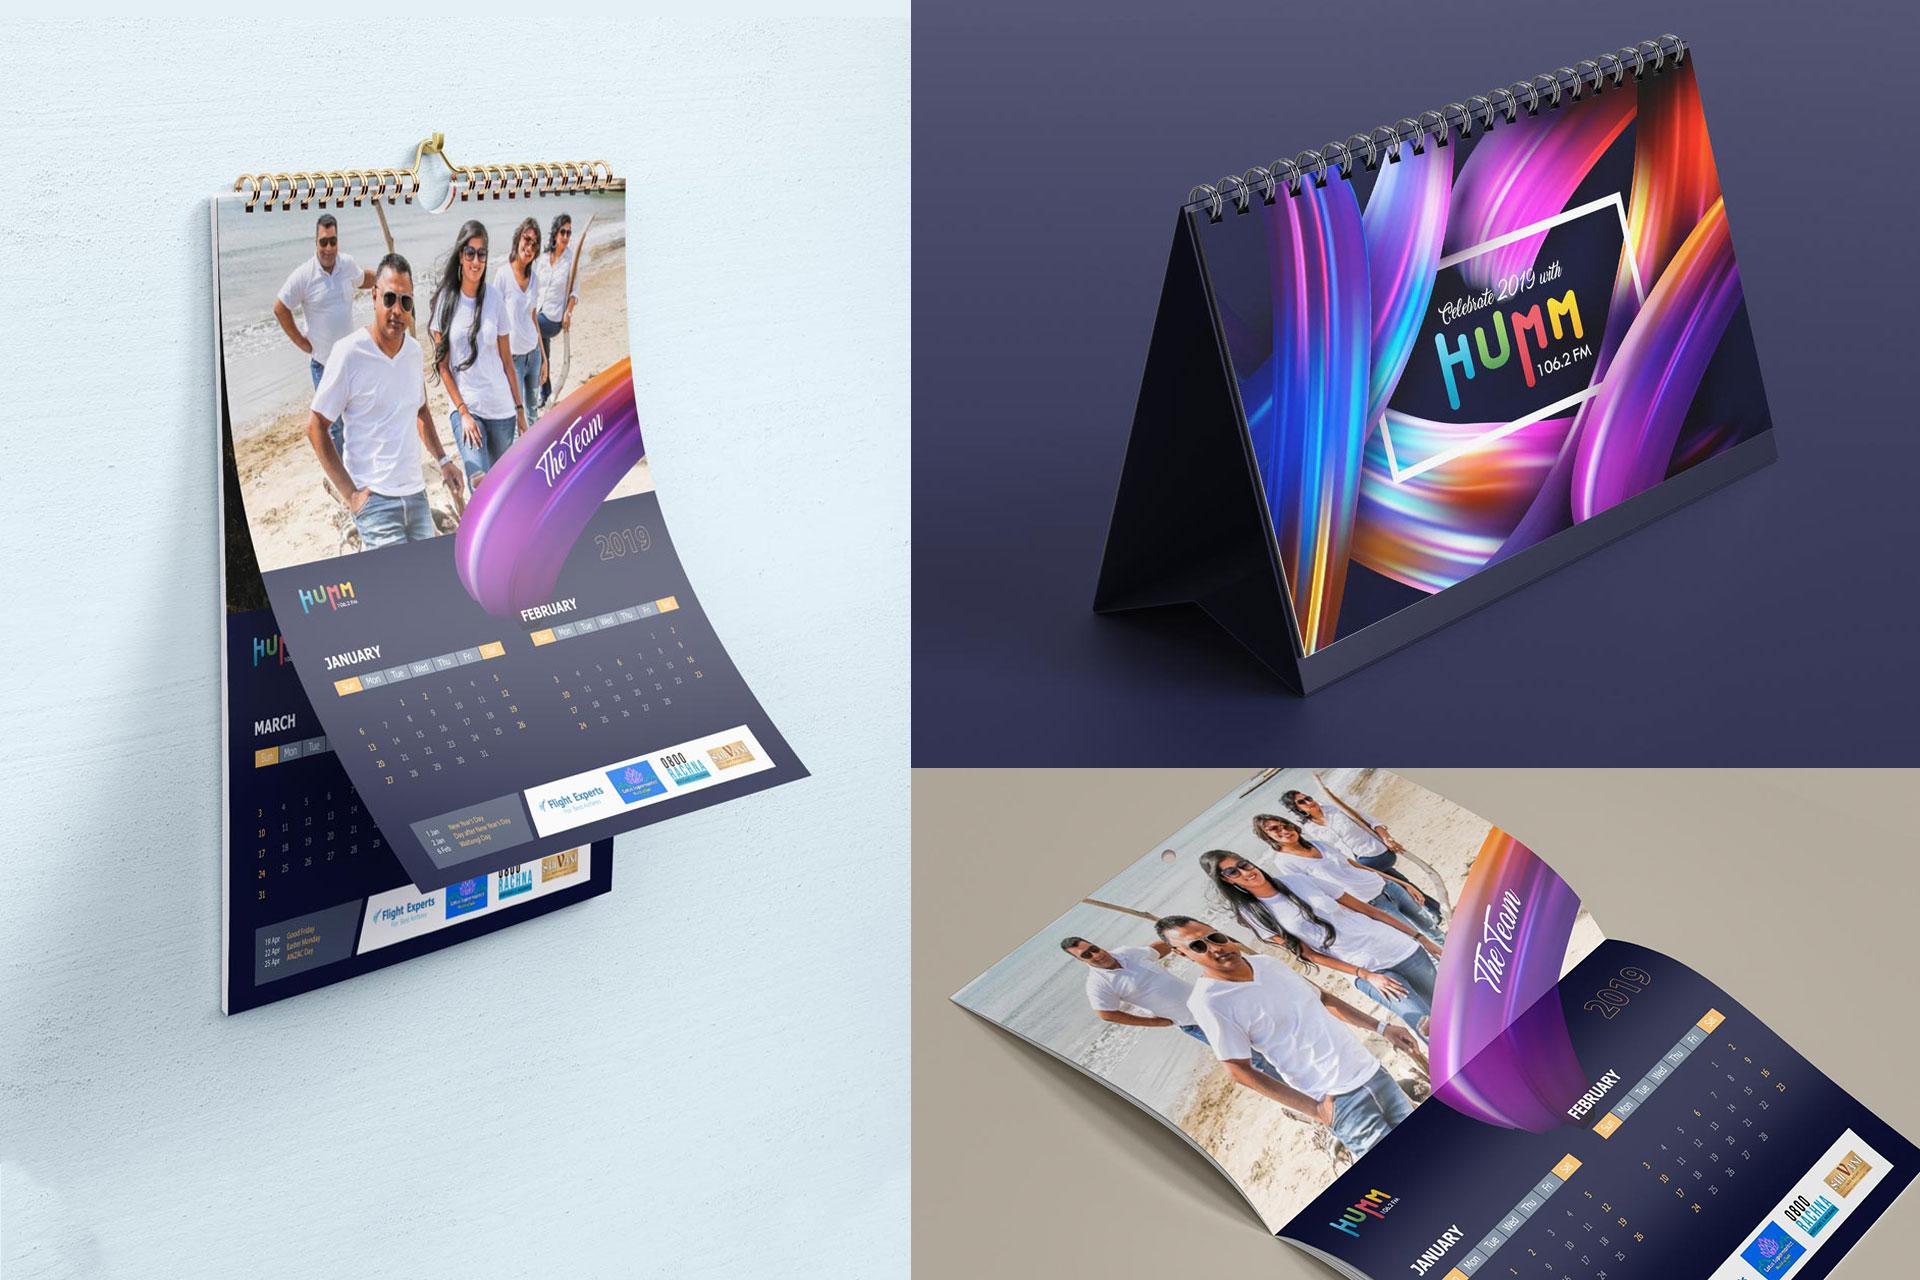 Humm Fm calendar design